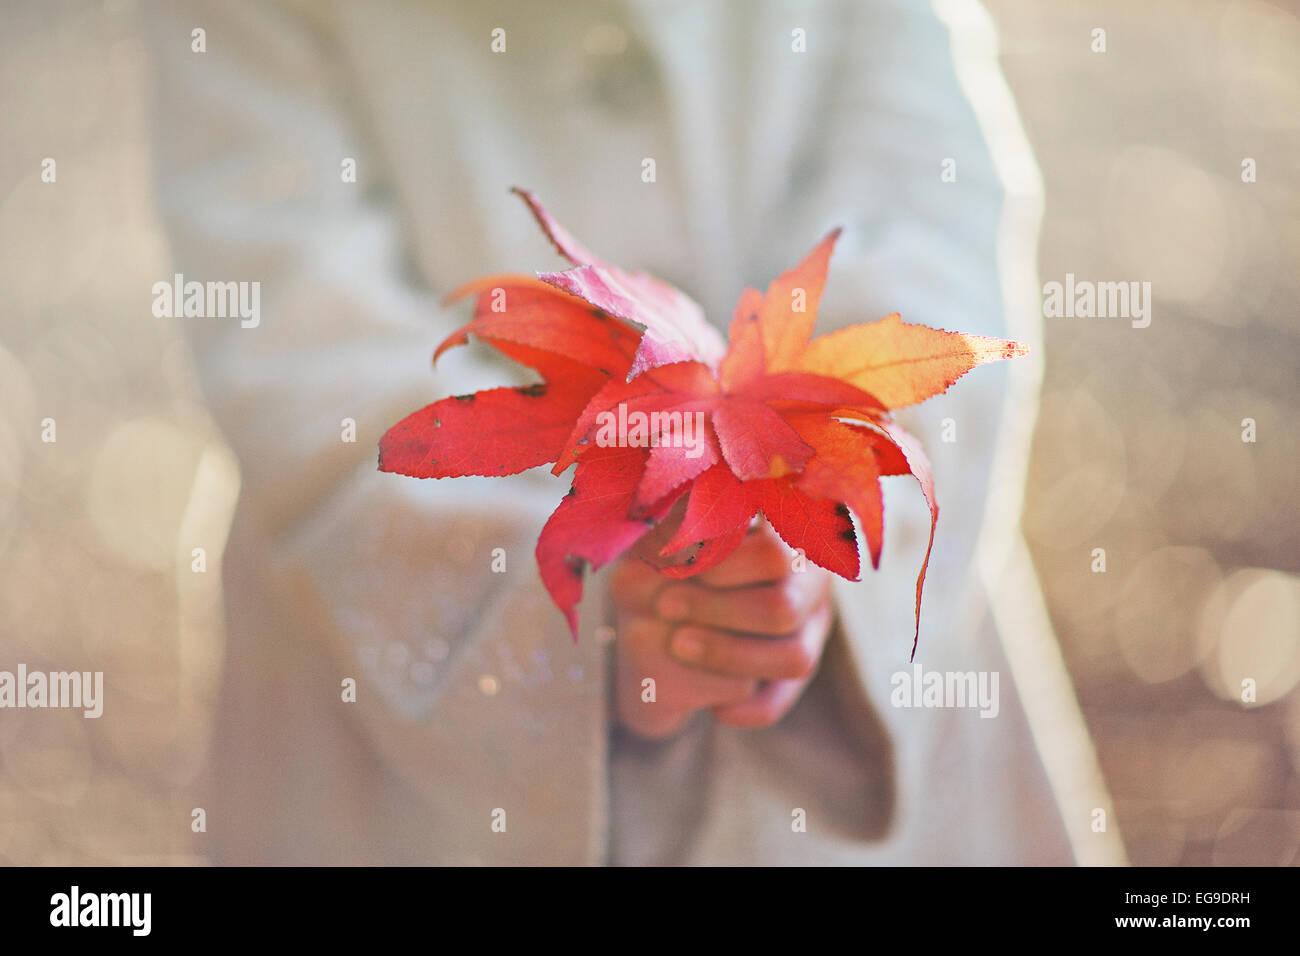 Girl holding fall leaves Photo Stock